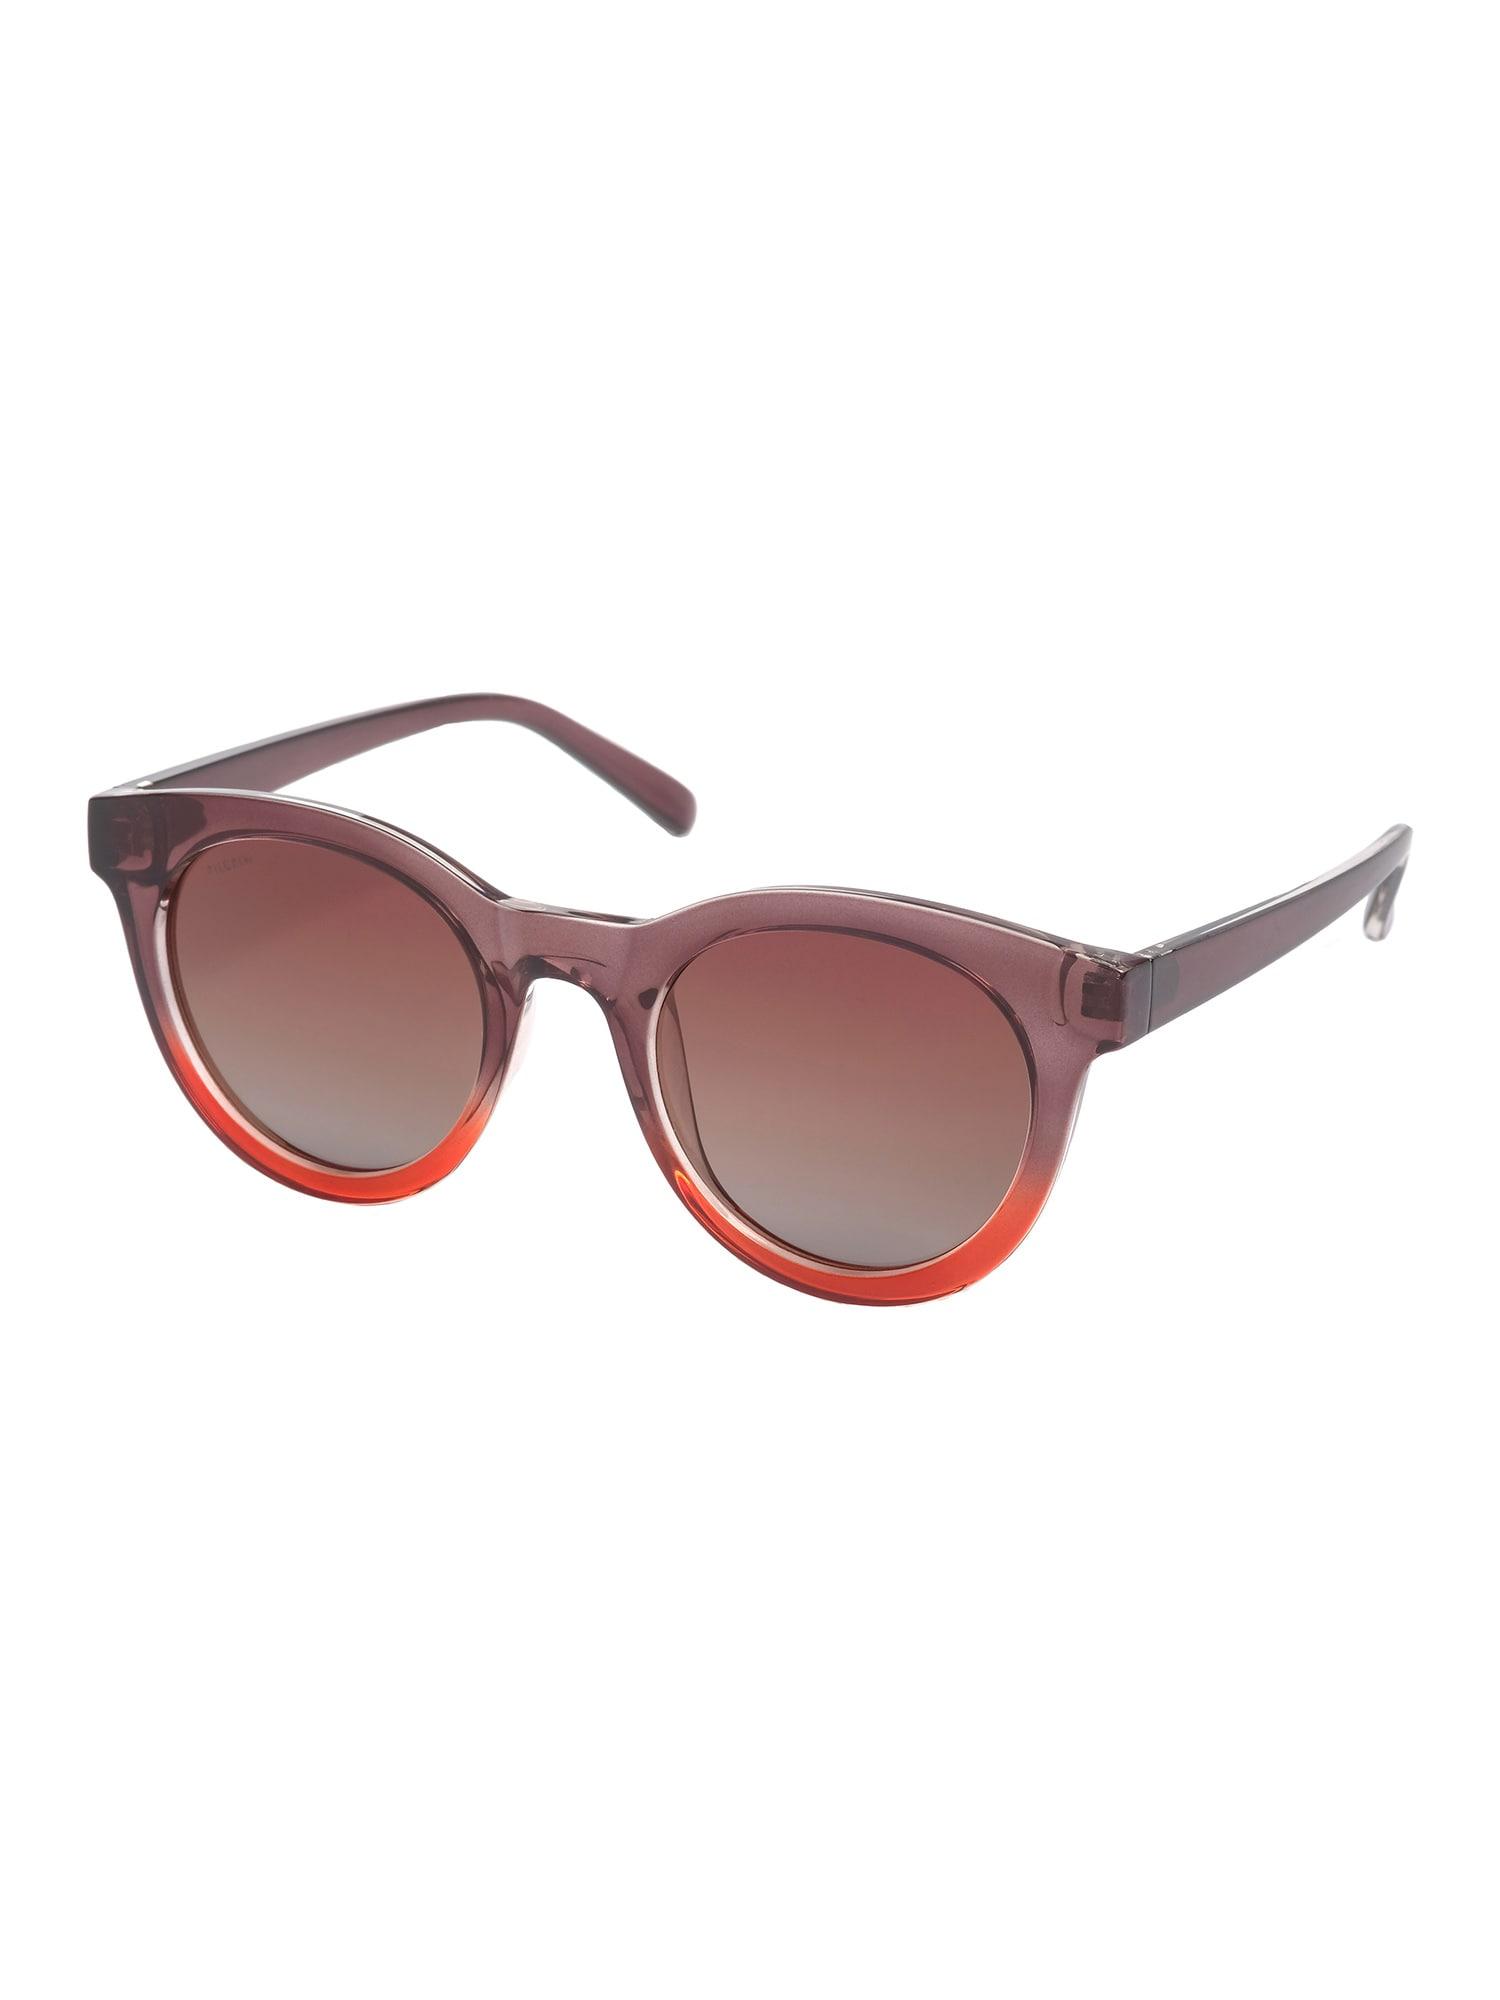 Sluneční brýle Tamara červená Pilgrim